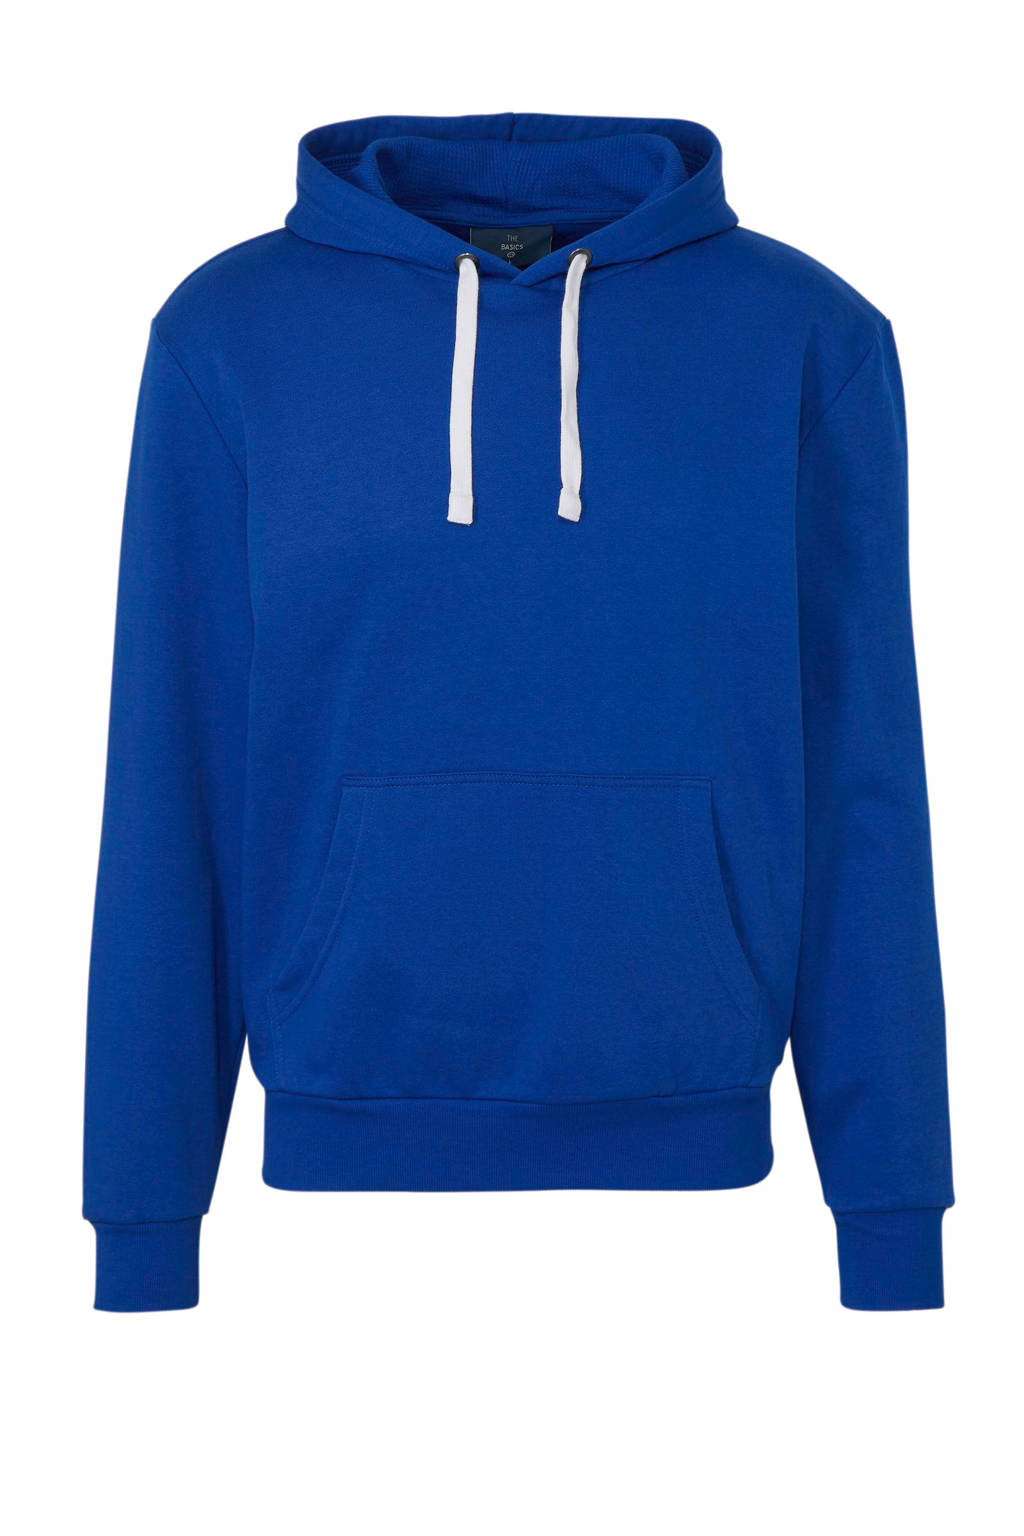 C&A Angelo Litrico hoodie blauw, Blauw